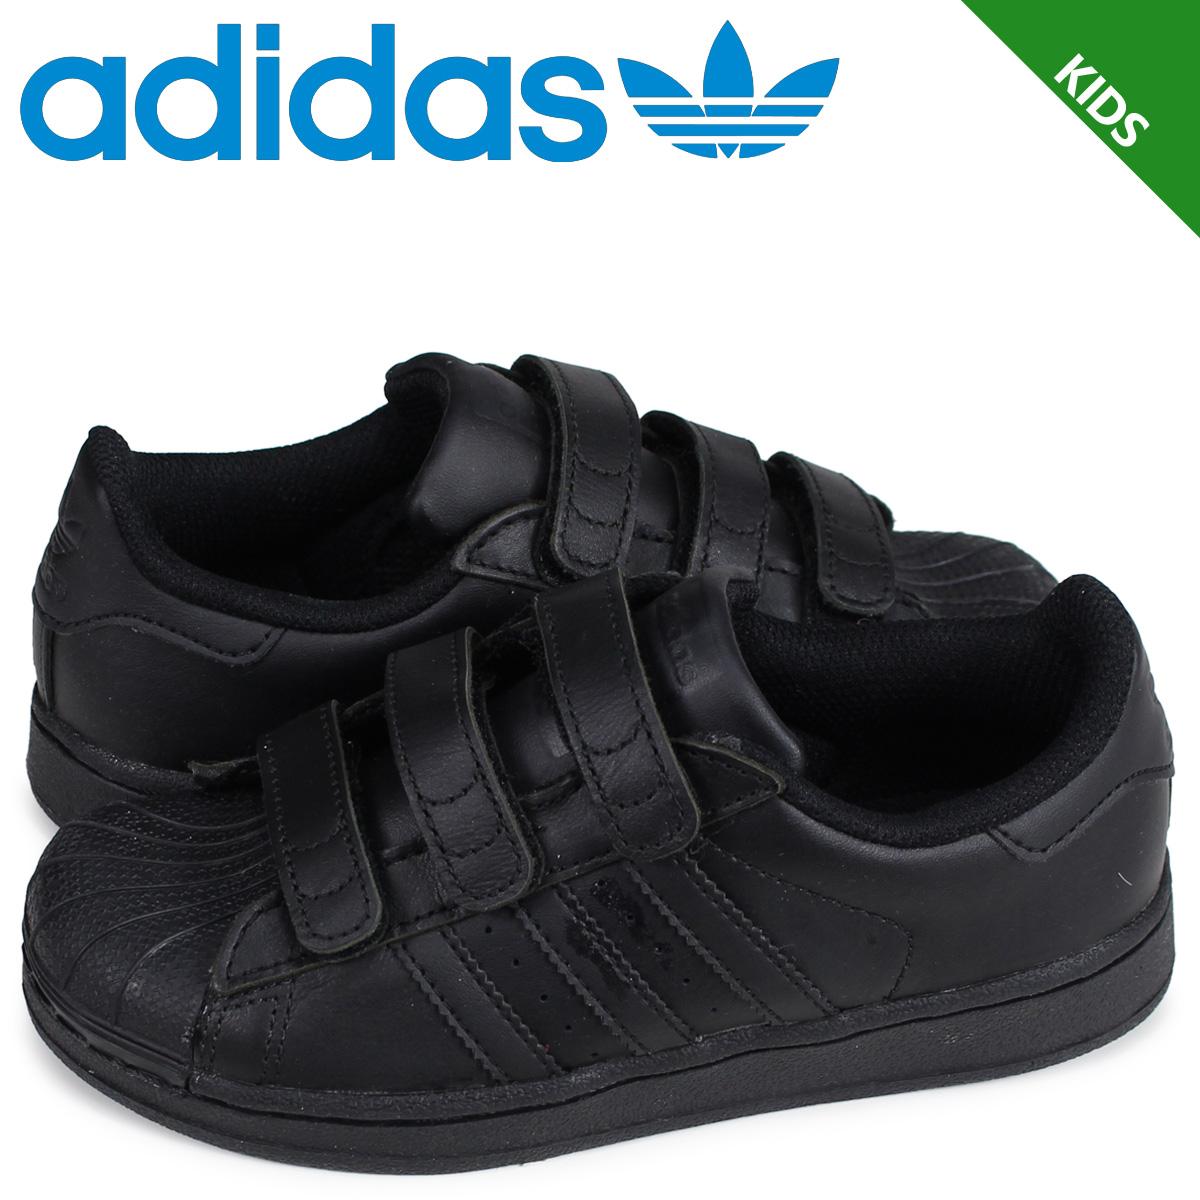 b9245cdd8c3 Adidas originals adidas Originals superstar sneakers kids Velcro SUPERSTAR  FOUNDATION CF C black black B25728  4 3 Shinnyu load